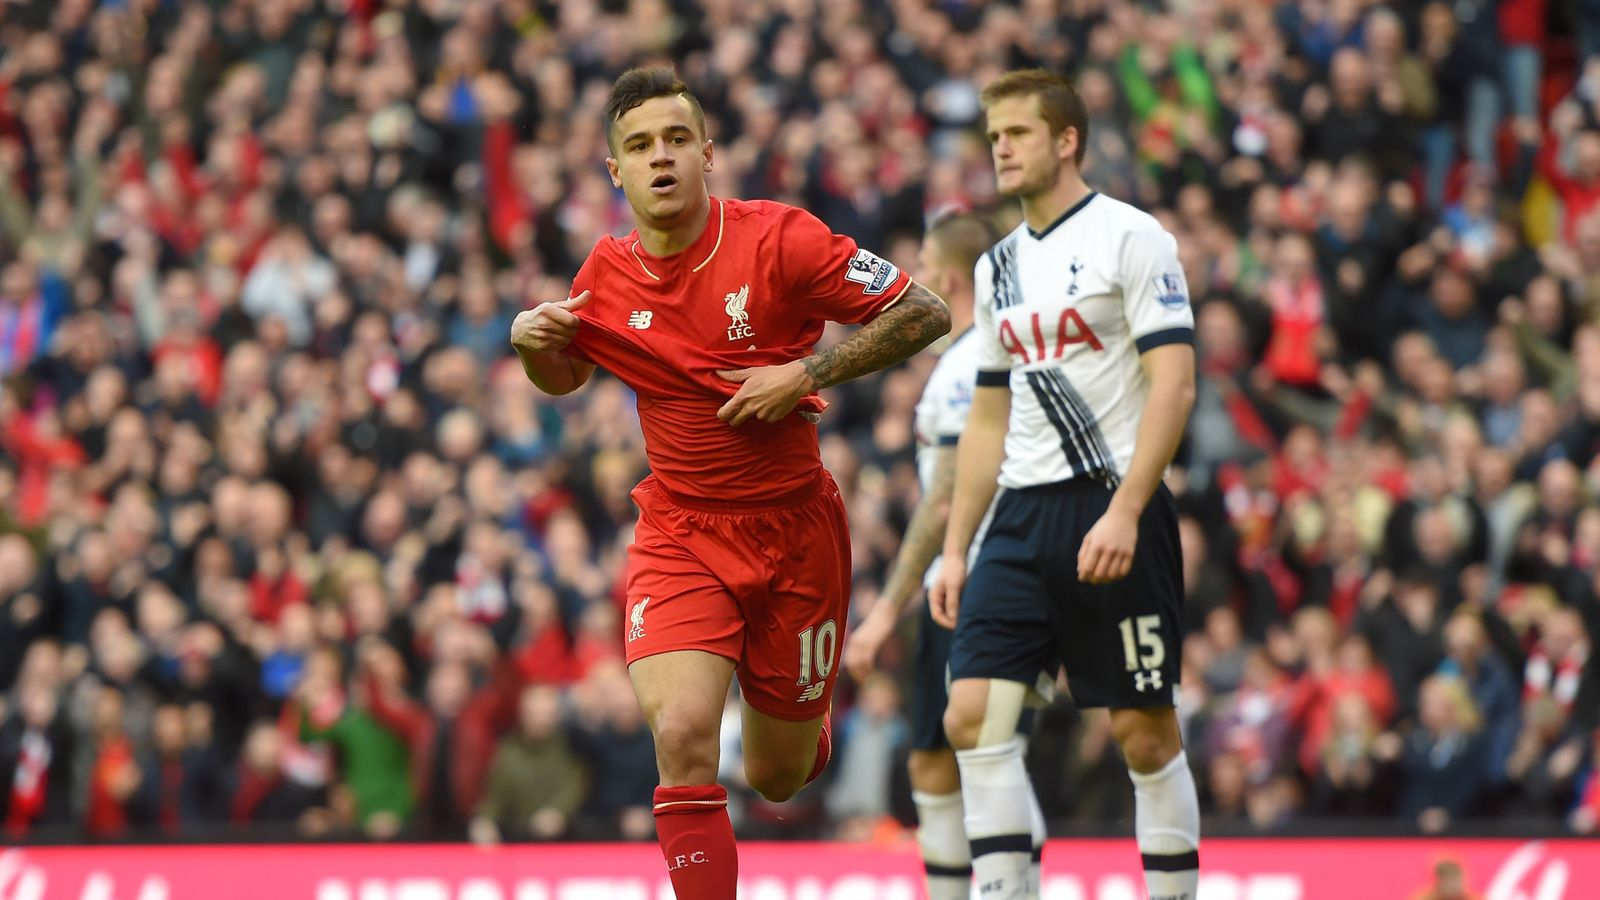 Liverpool 1 - 1 Tottenham - Match Report & Highlights